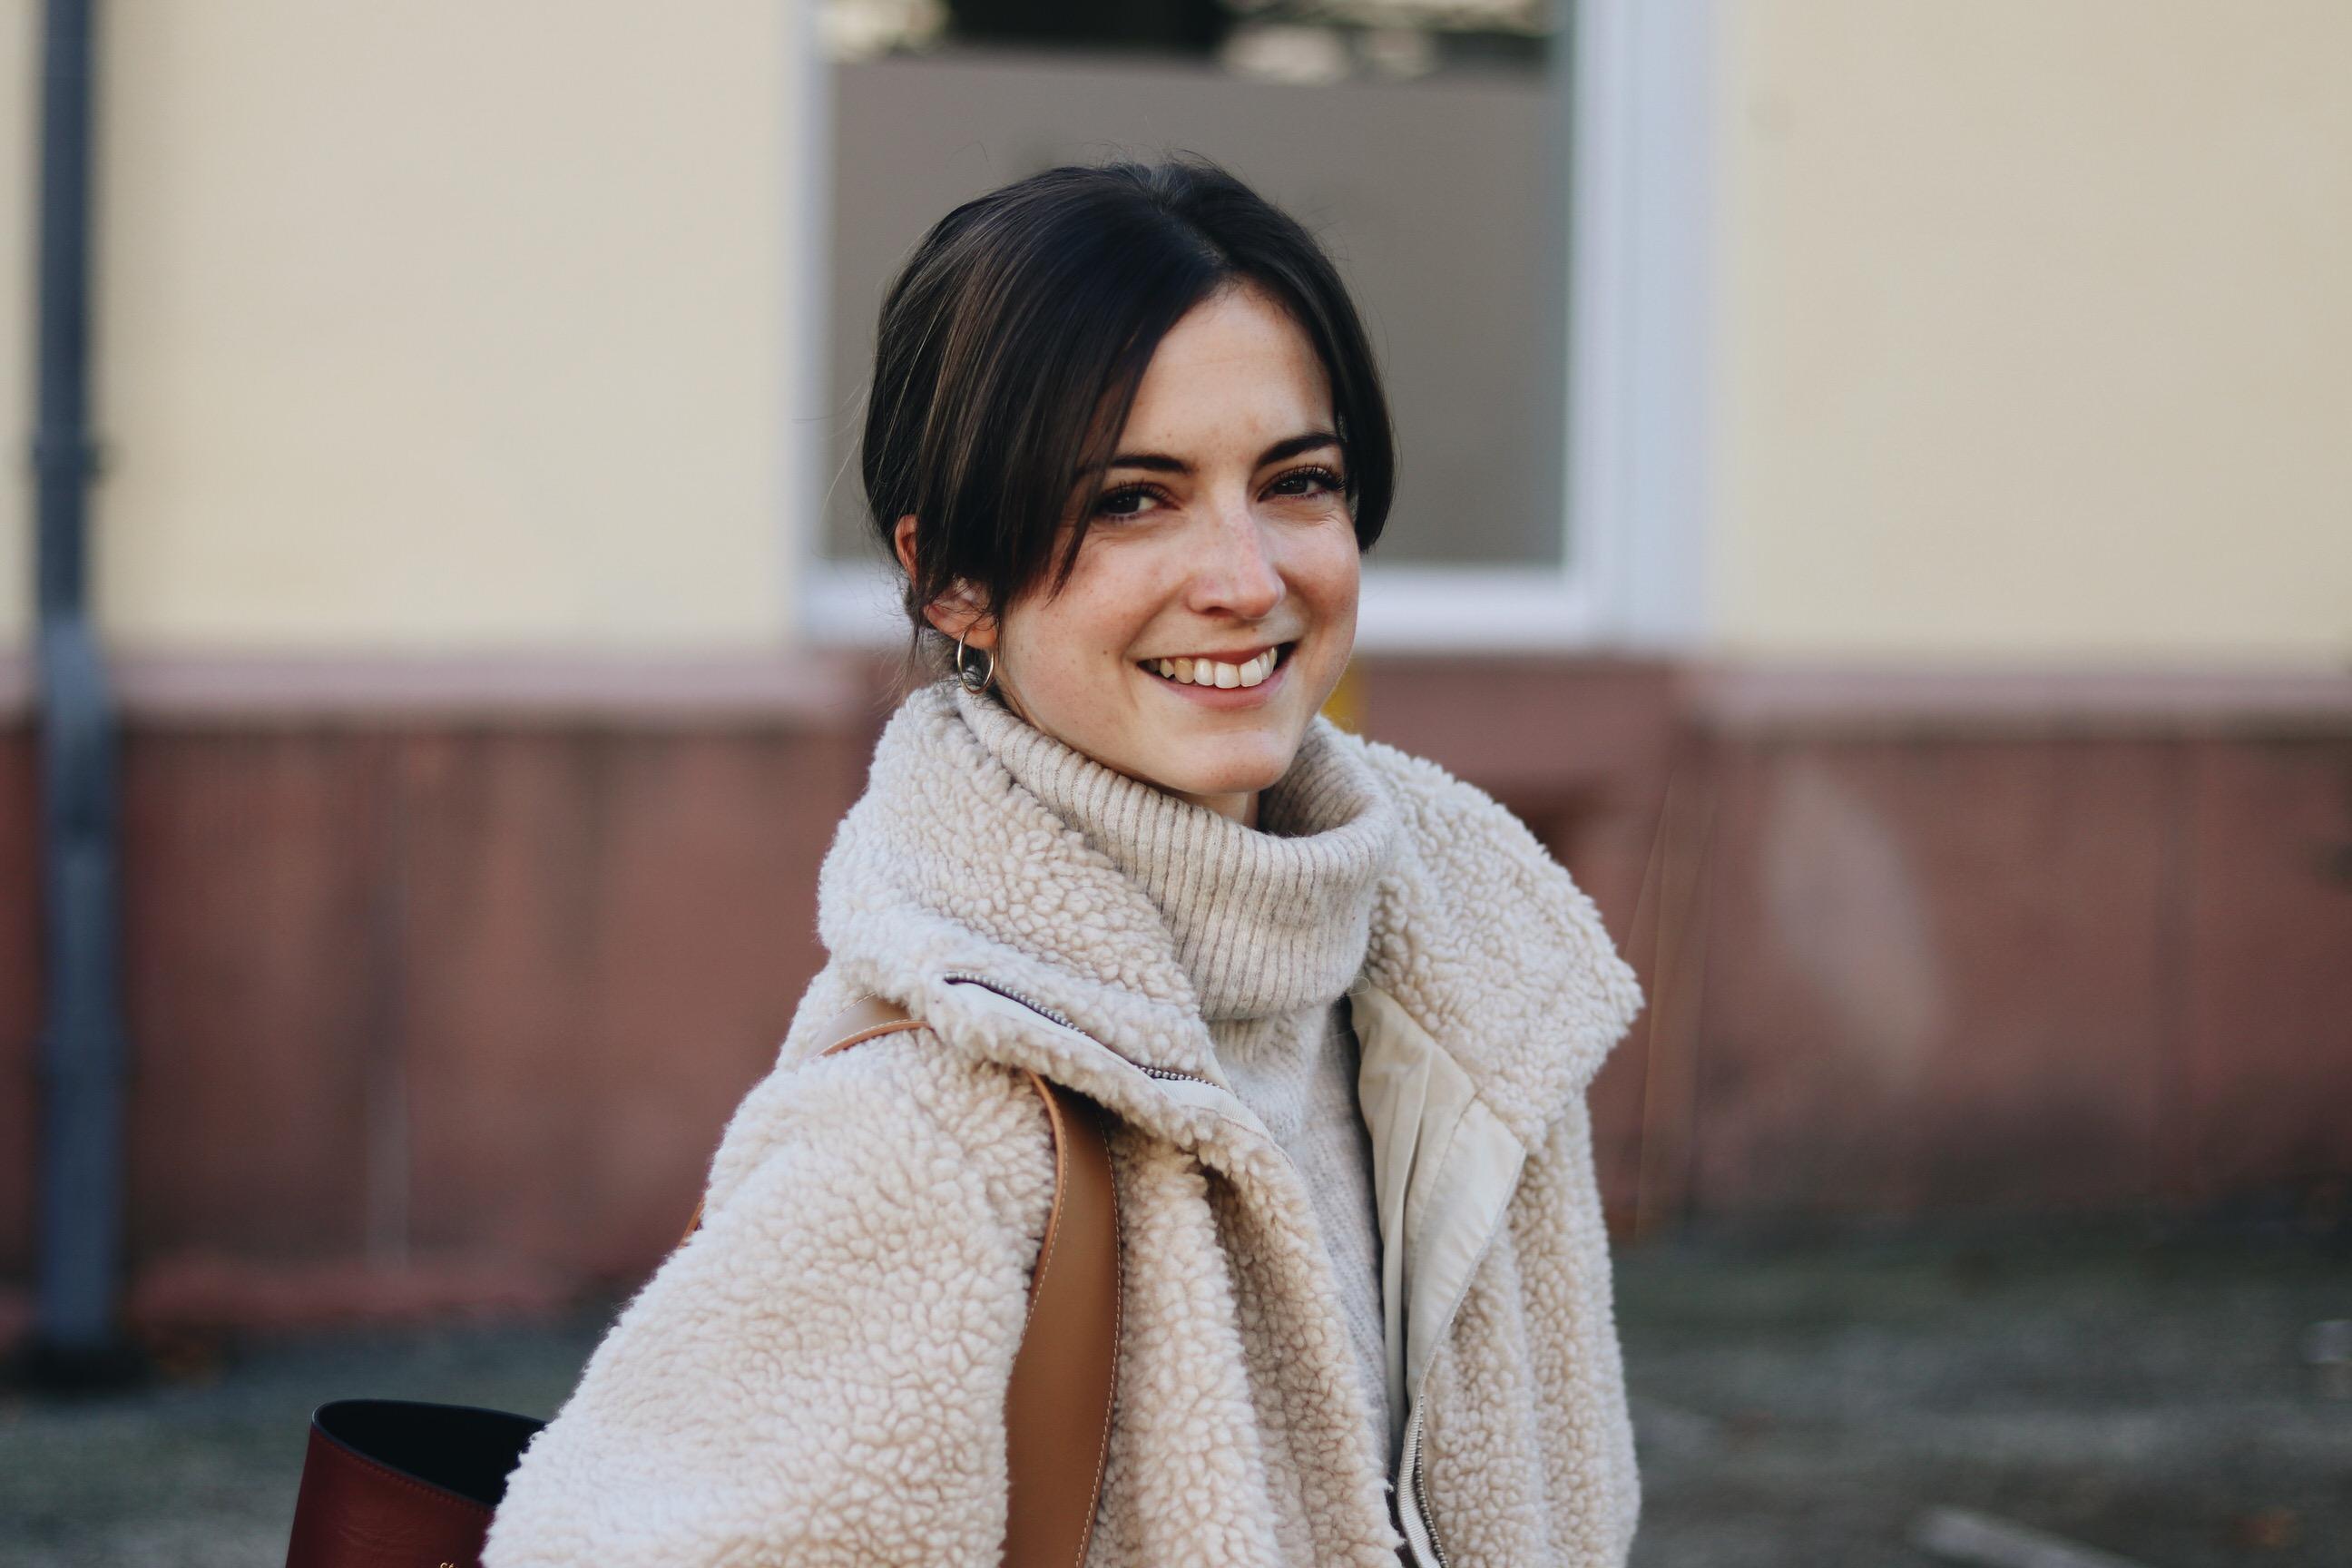 Teddyjacke Modebloggerin Neele Freiburg deutsch Modeblog Top 10 Winter Outfit